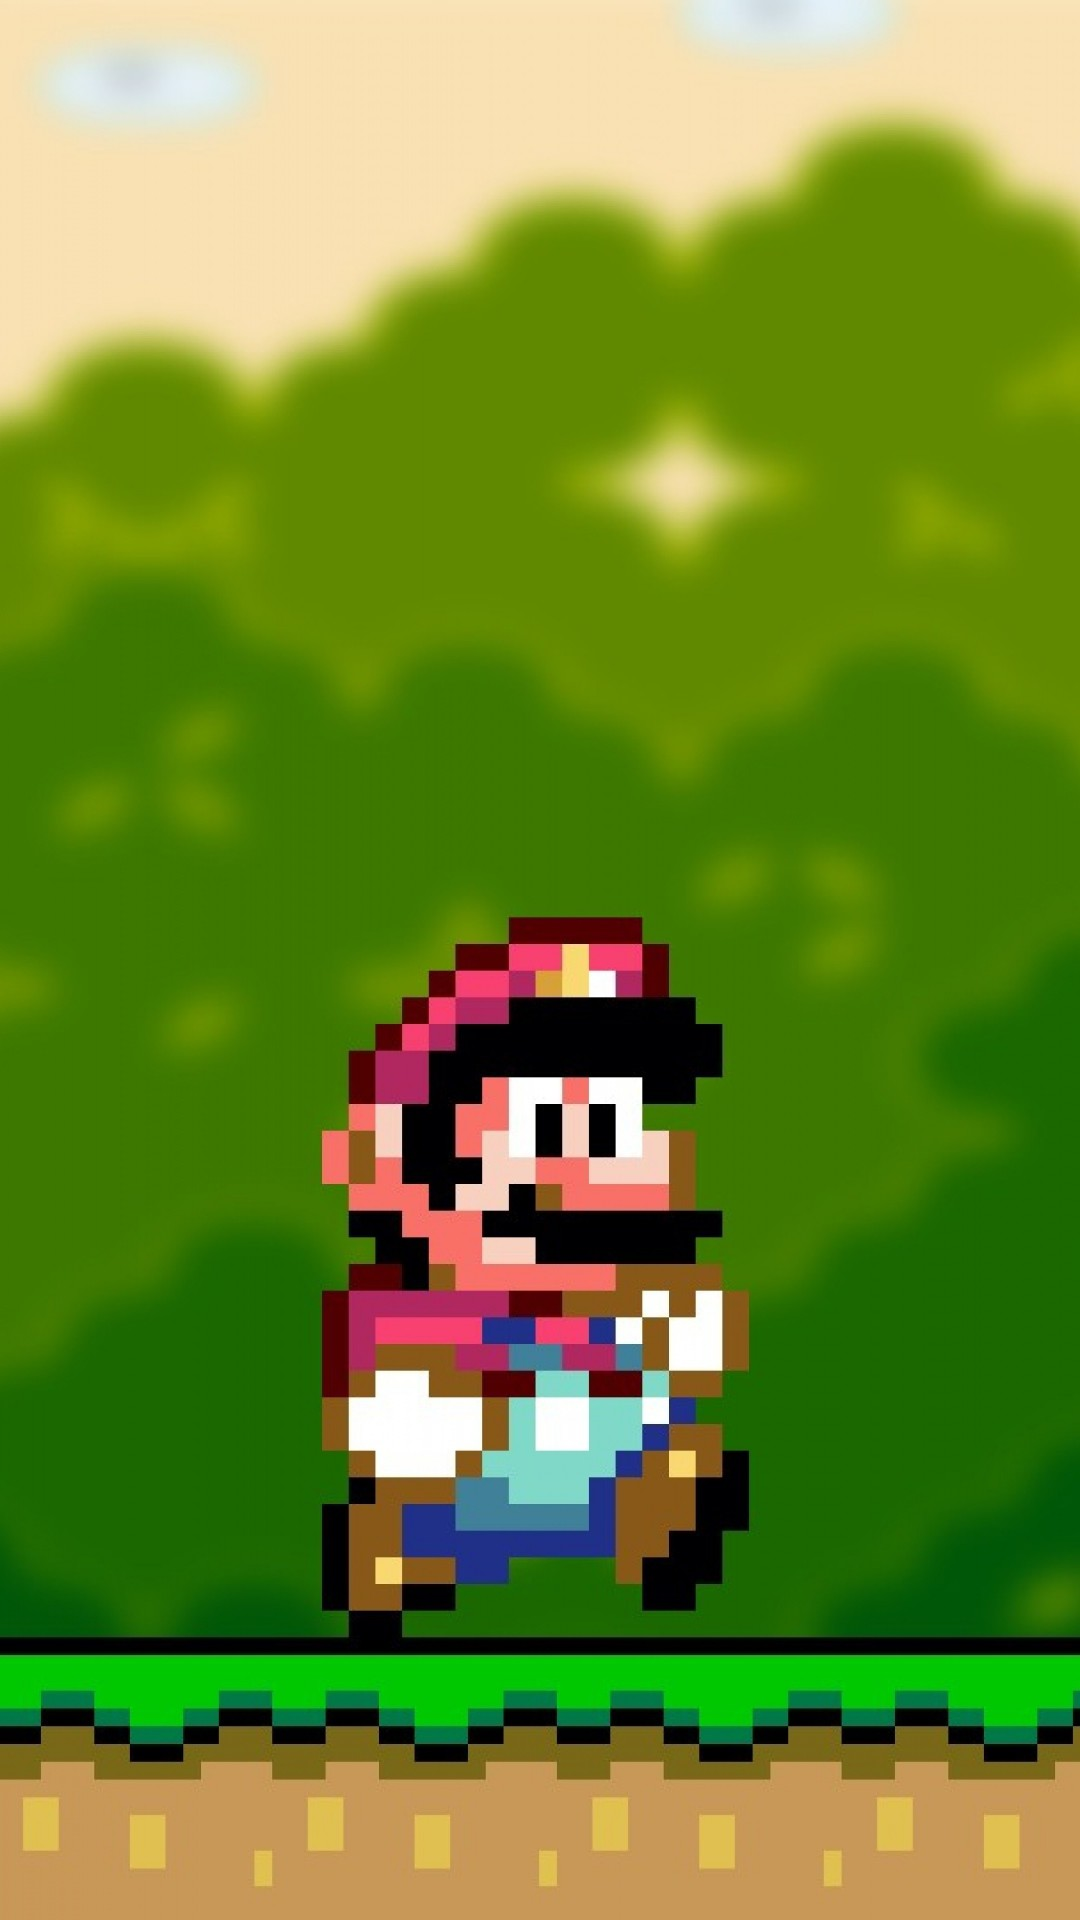 Res: 1080x1920, Sfondi per iPhone: 5 immagini dedicate a Super Mario Bros